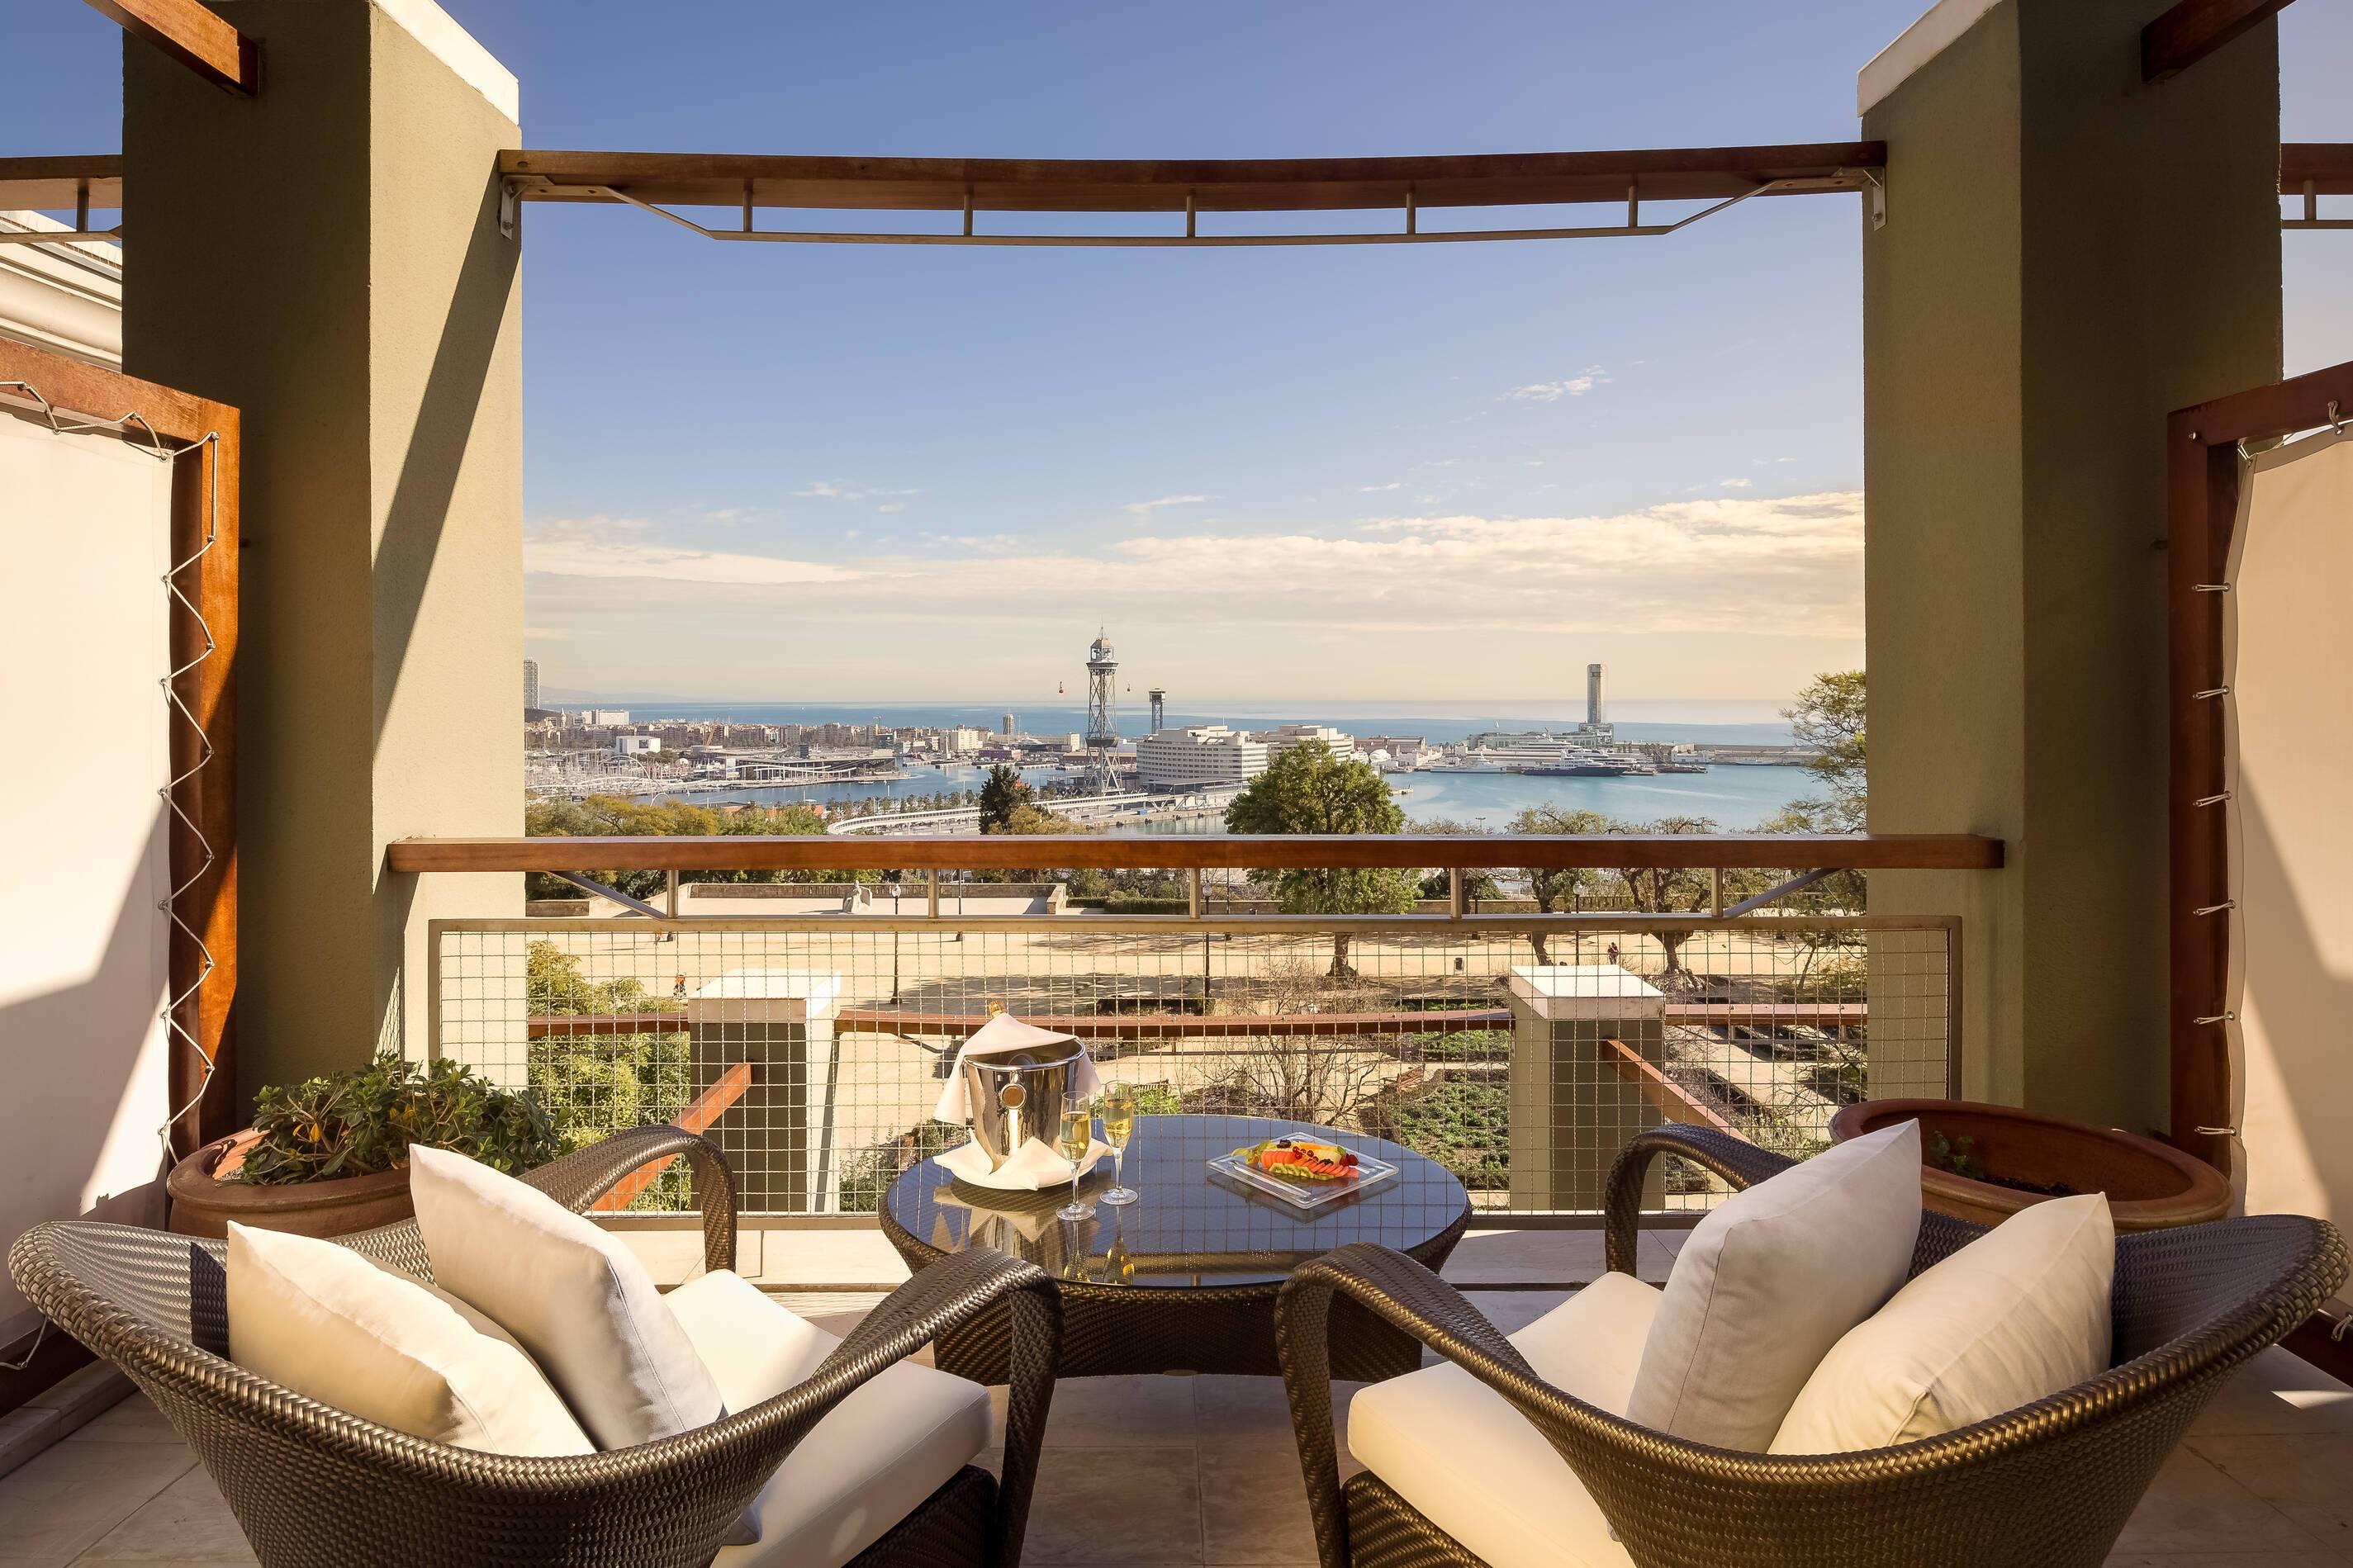 Miramar Barcelone suite mediteranea terrasse